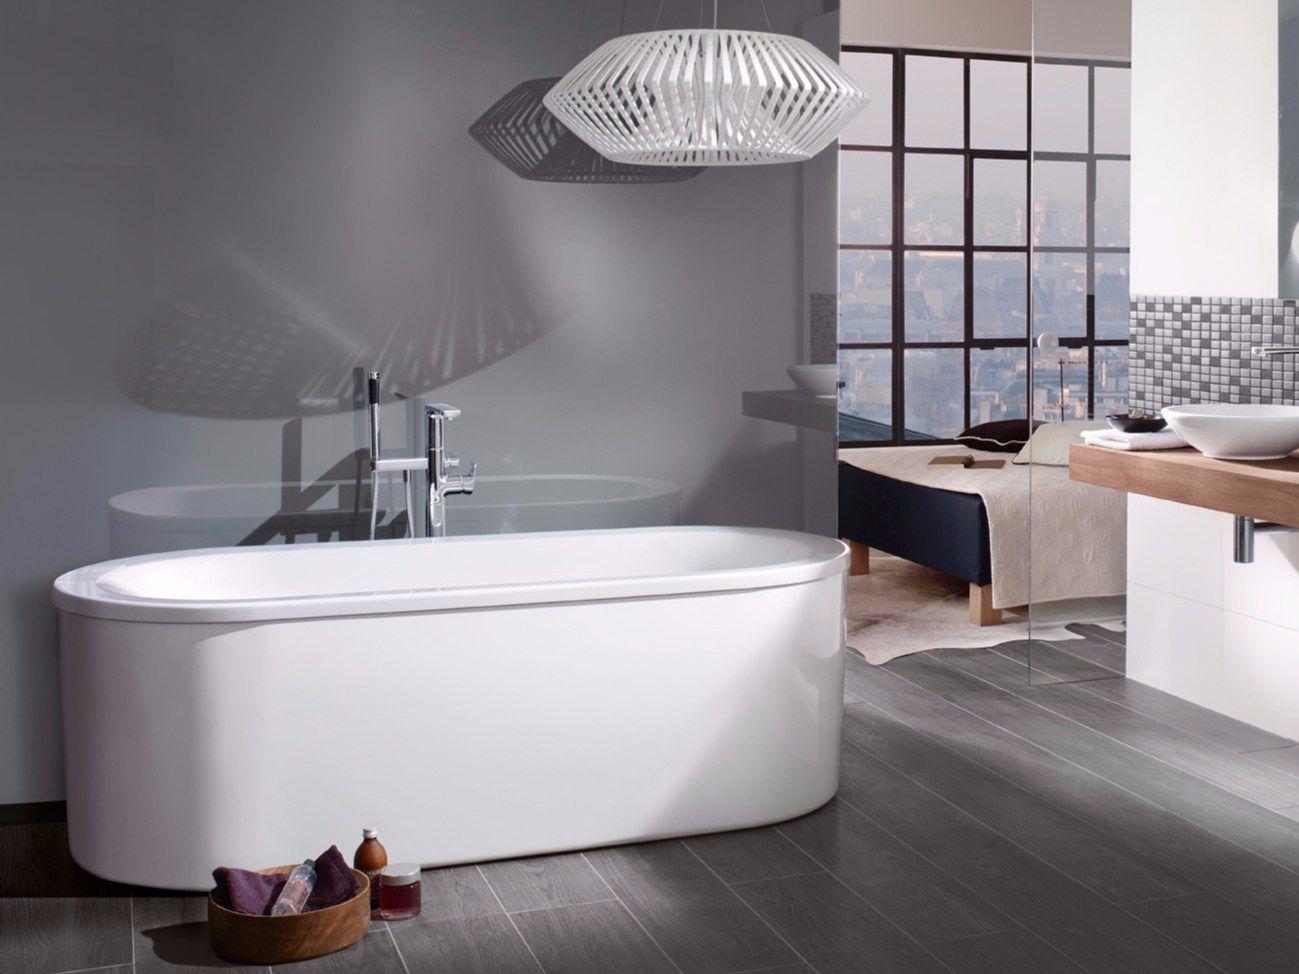 loop friends vasca da bagno in acrilico by villeroy boch. Black Bedroom Furniture Sets. Home Design Ideas